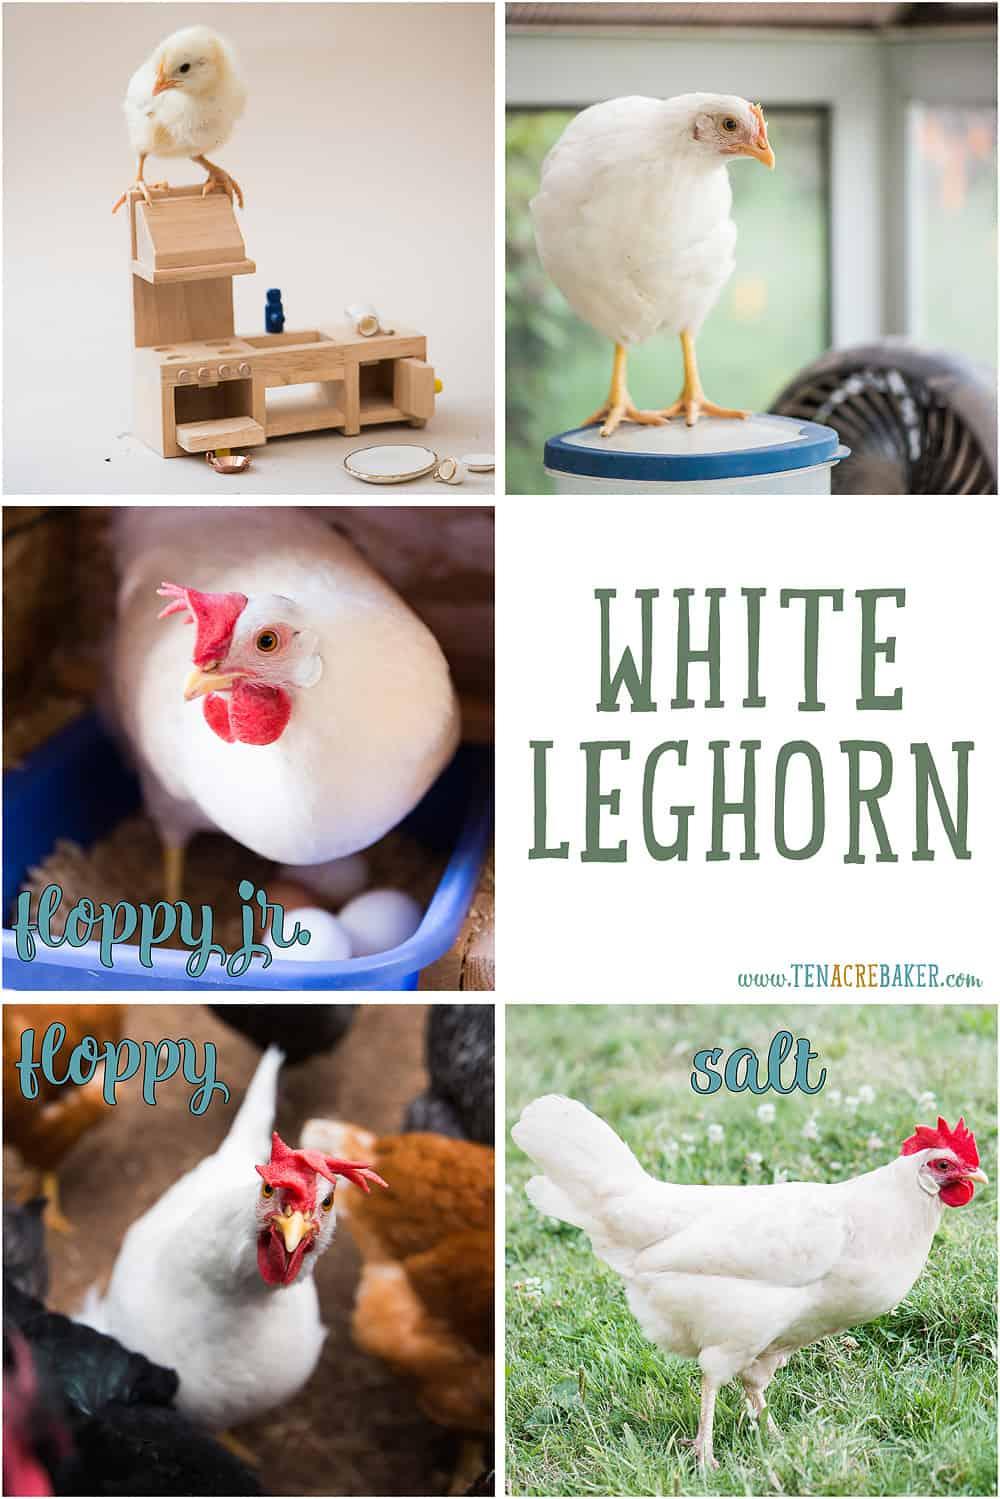 White Leghorn backyard chickens